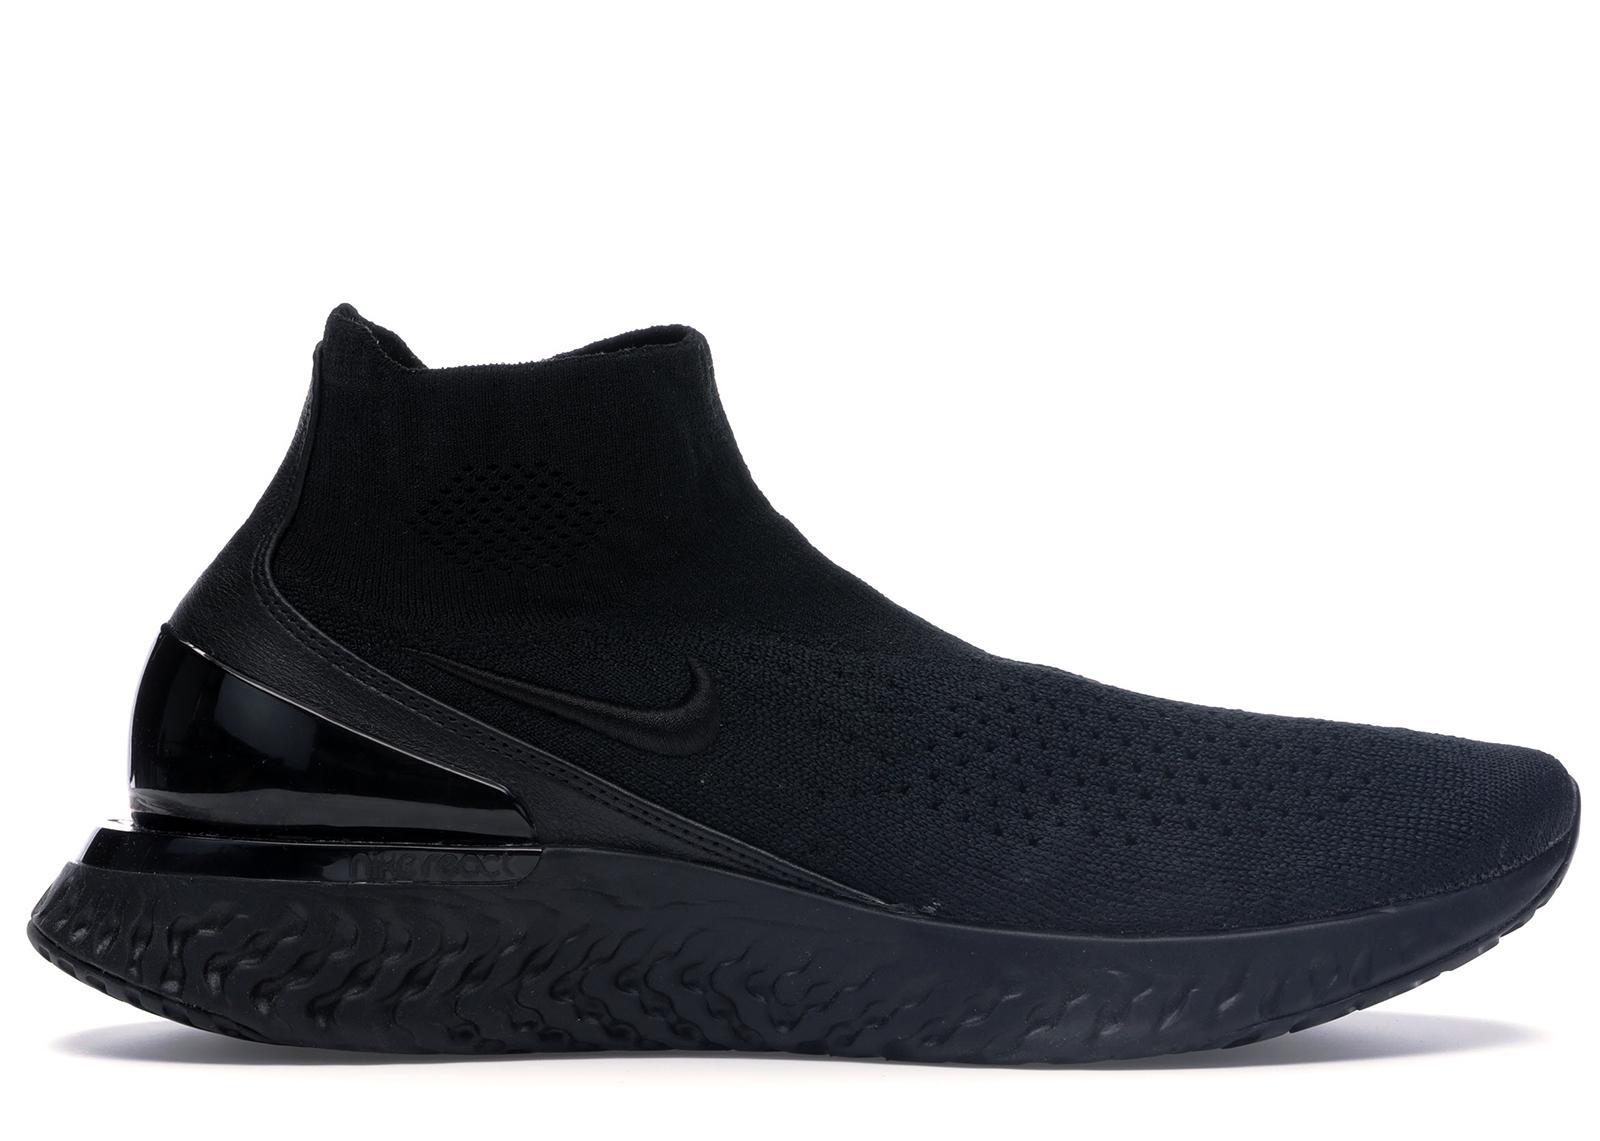 Nike Rise React Flyknit Triple Black